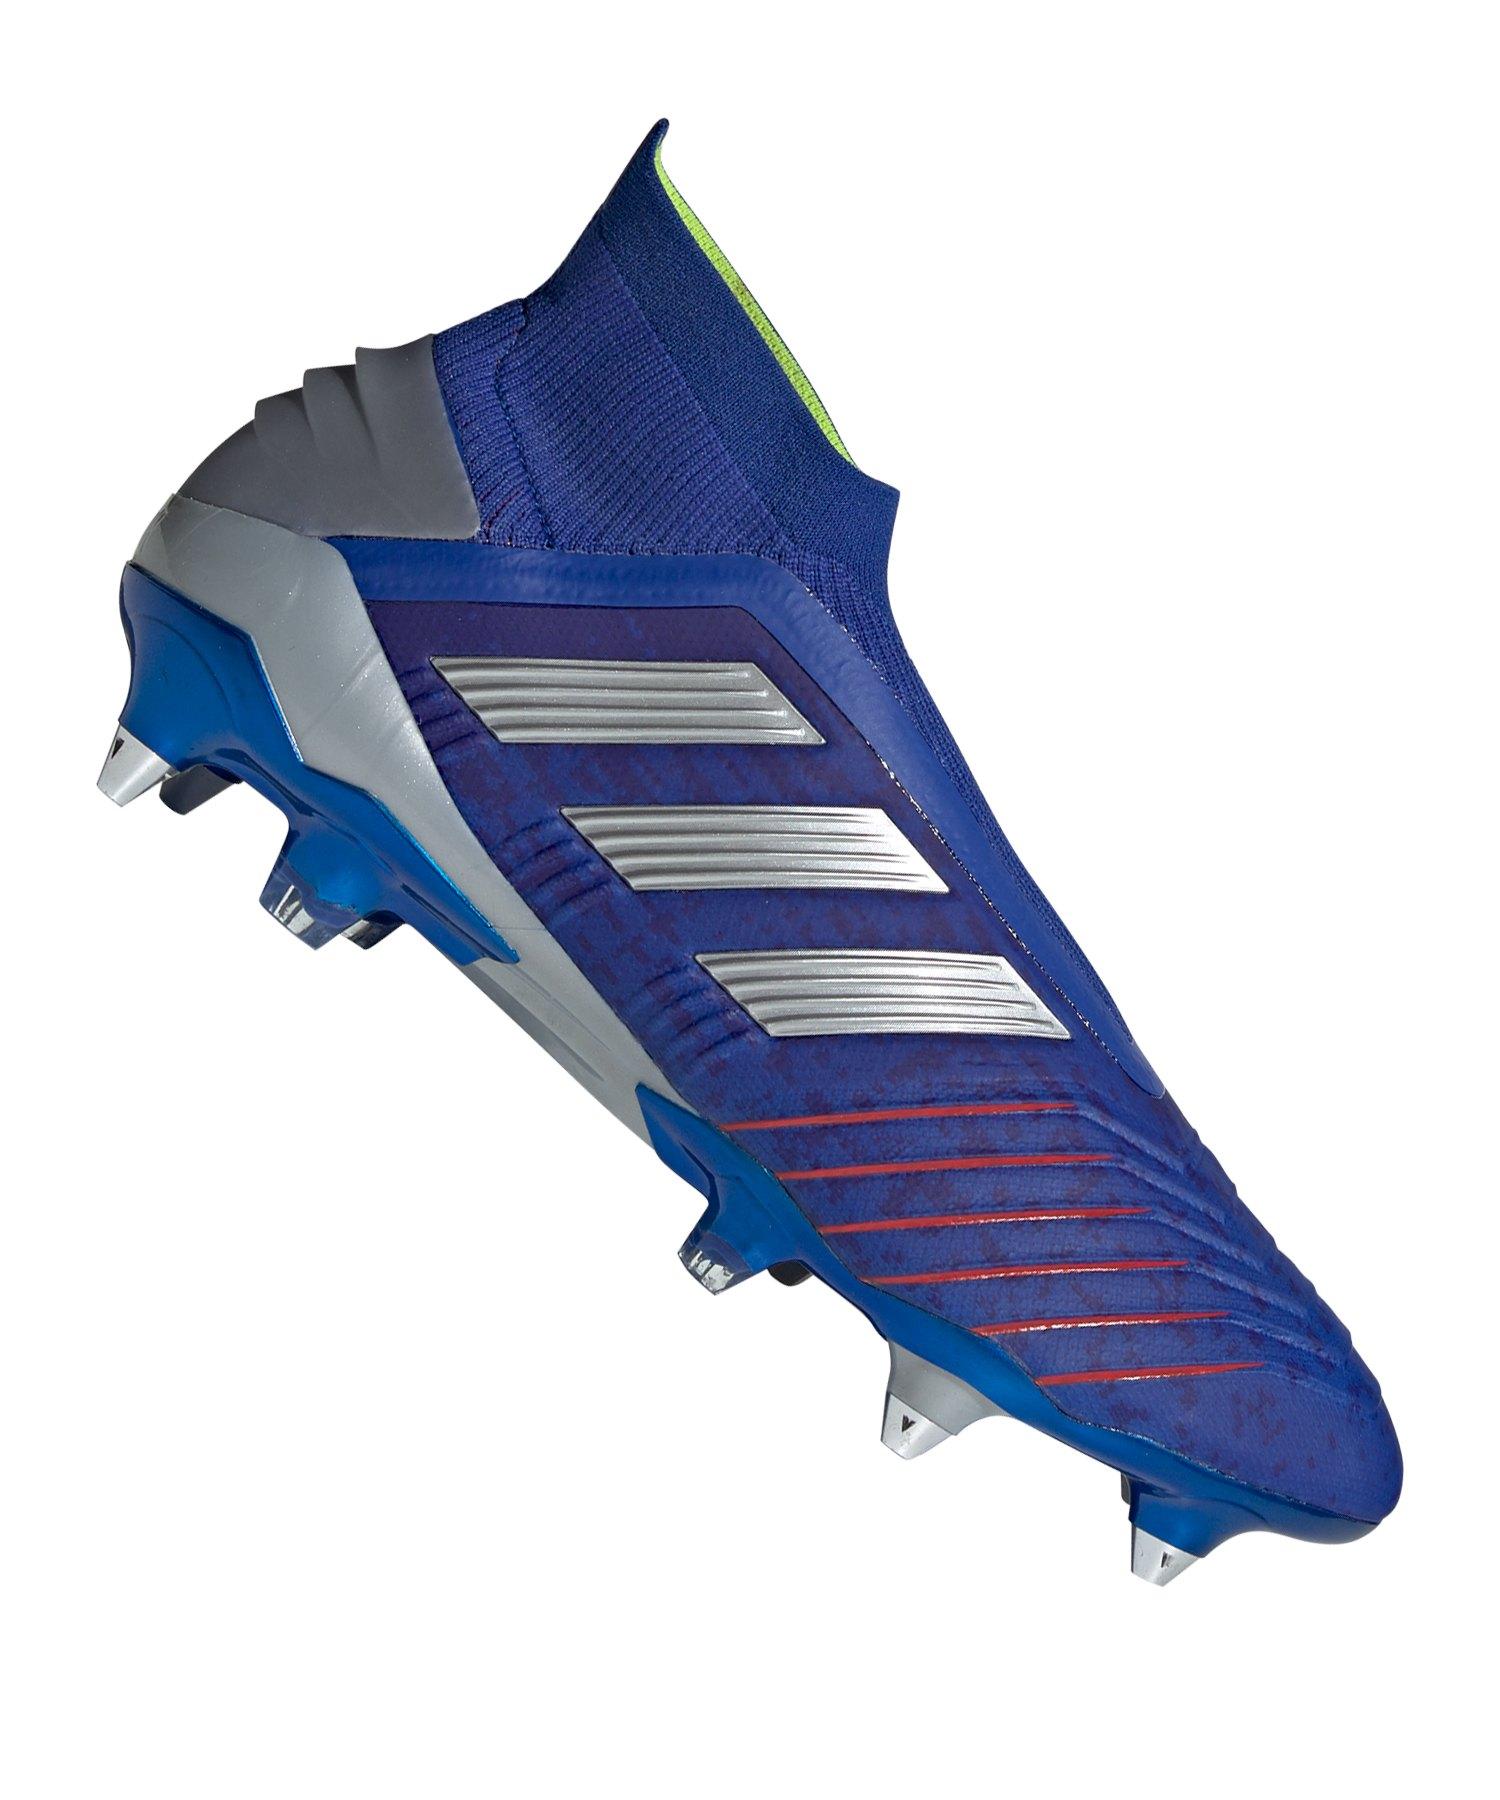 adidas Predator 19+ SG Blau Silber - blau